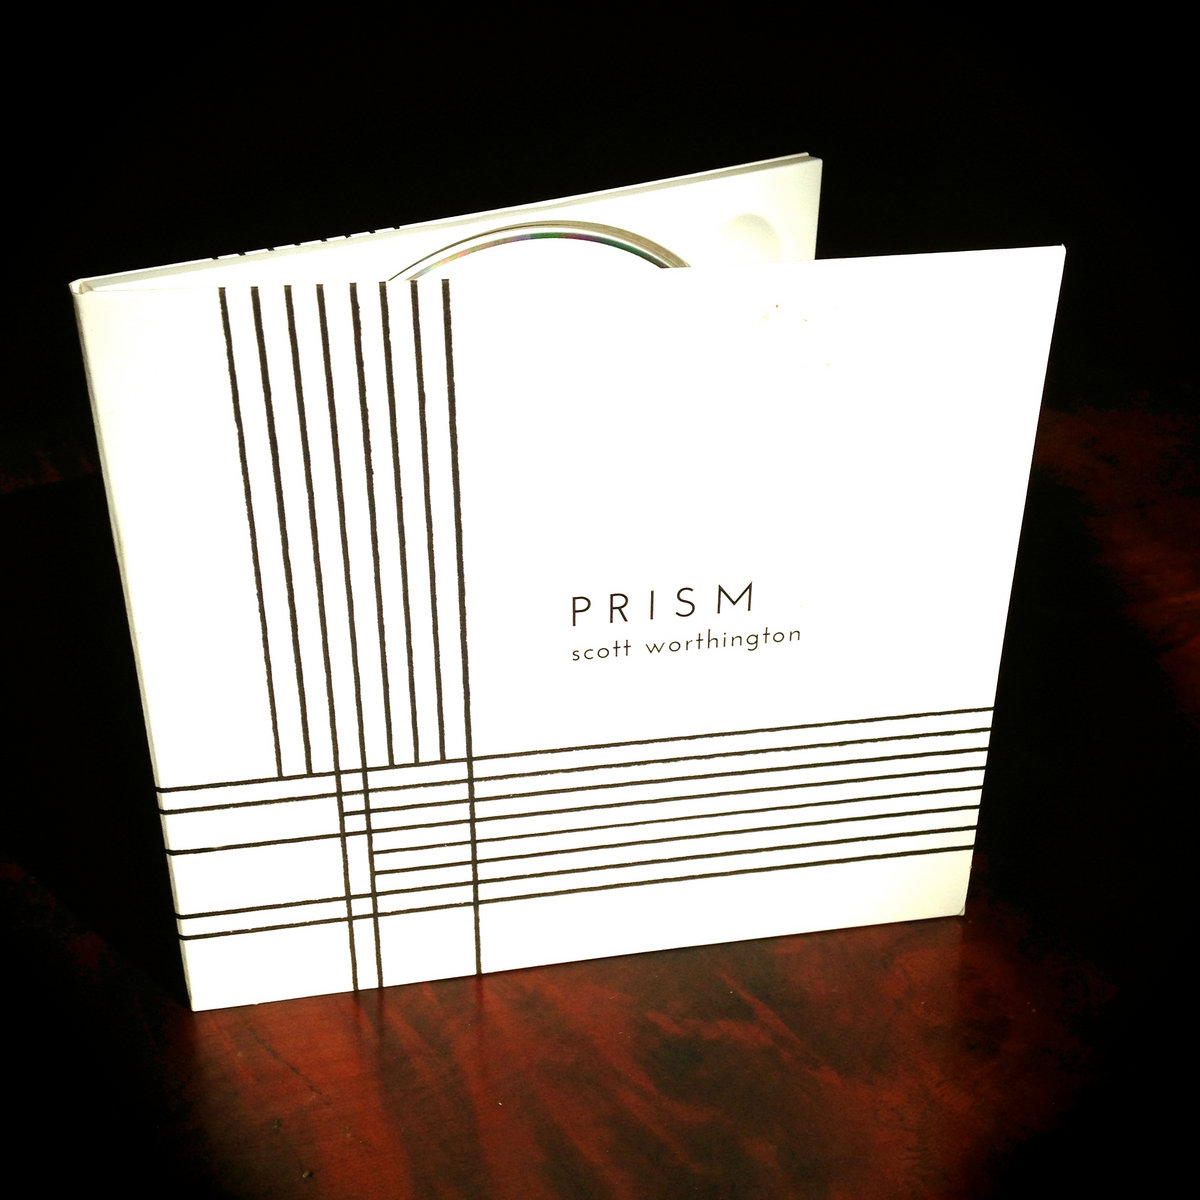 Prism – beth nielsen chapman.